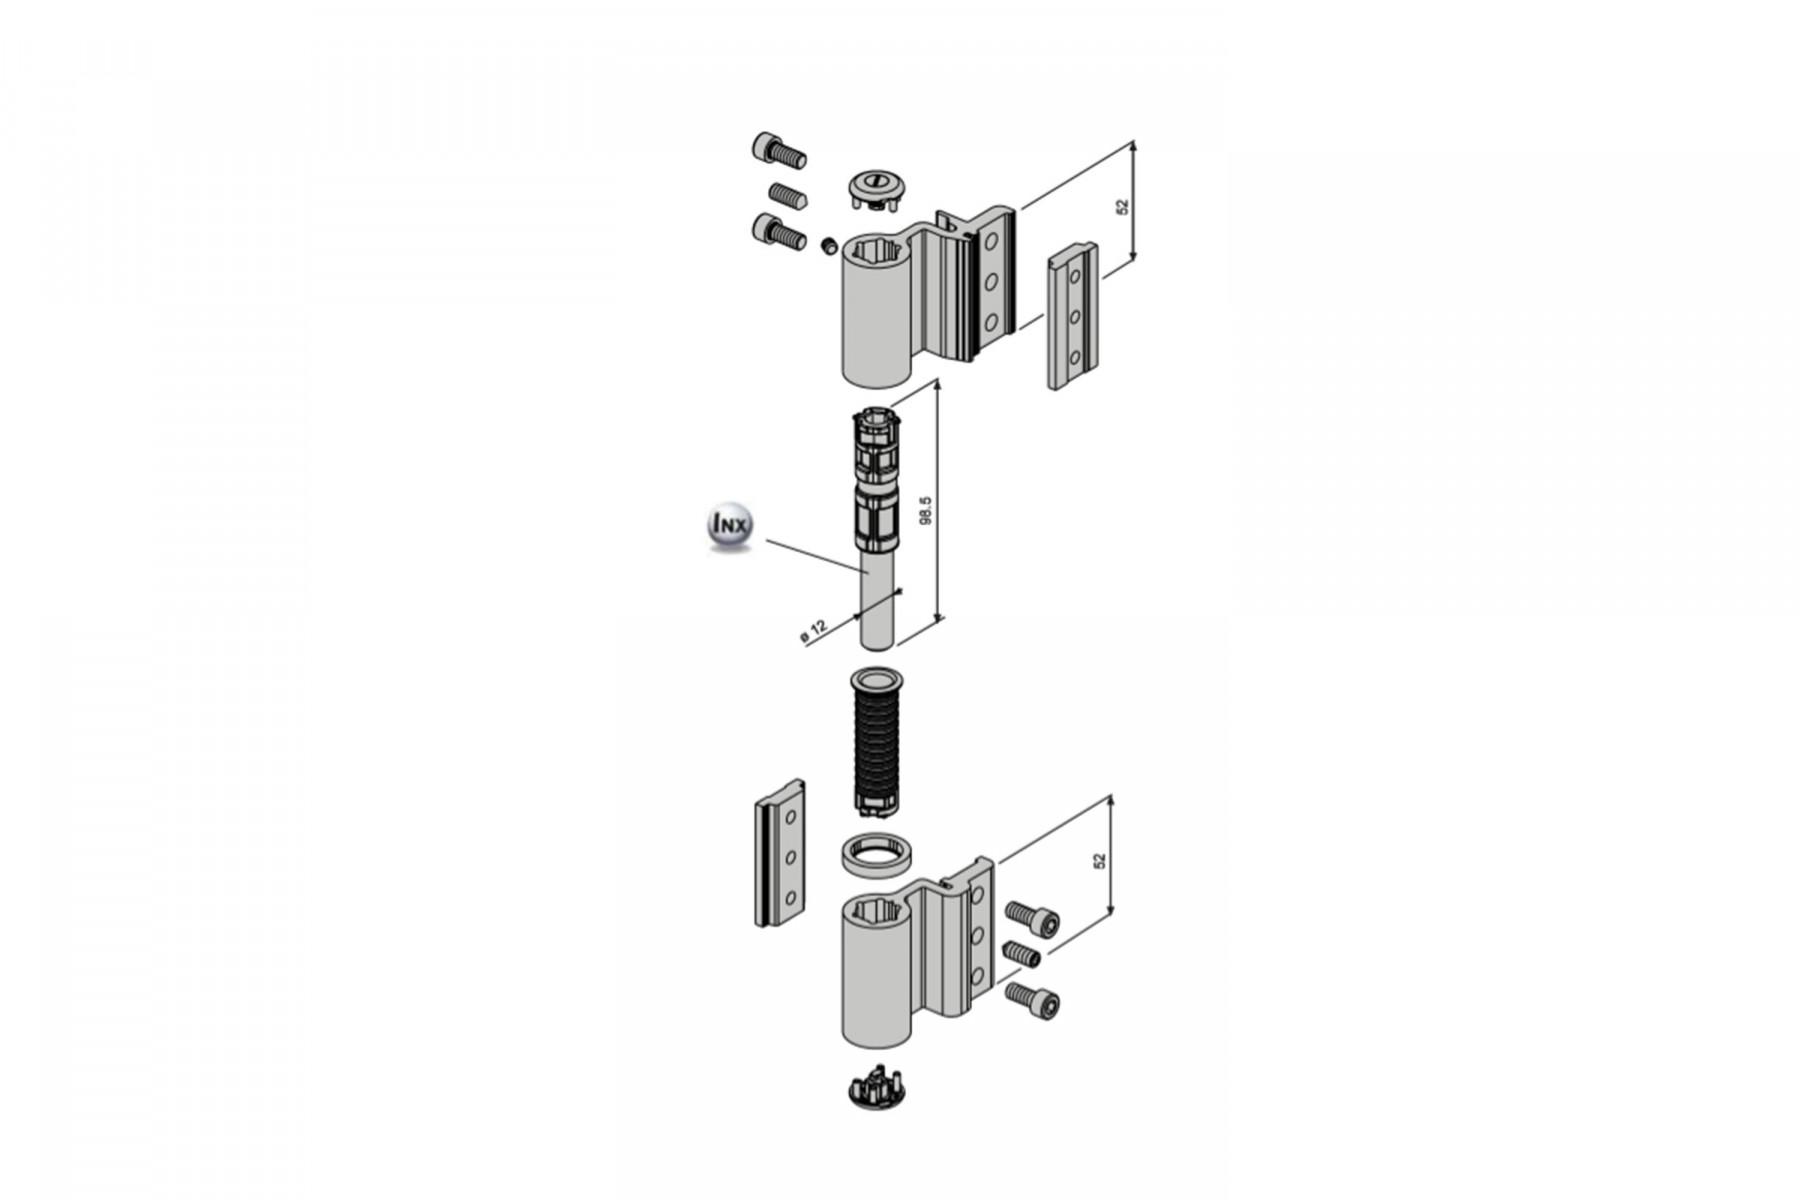 Paumelle Velox Top alu 5500I FAPIM 2 lames EL 17mm - Noir 9005 - 5520_37